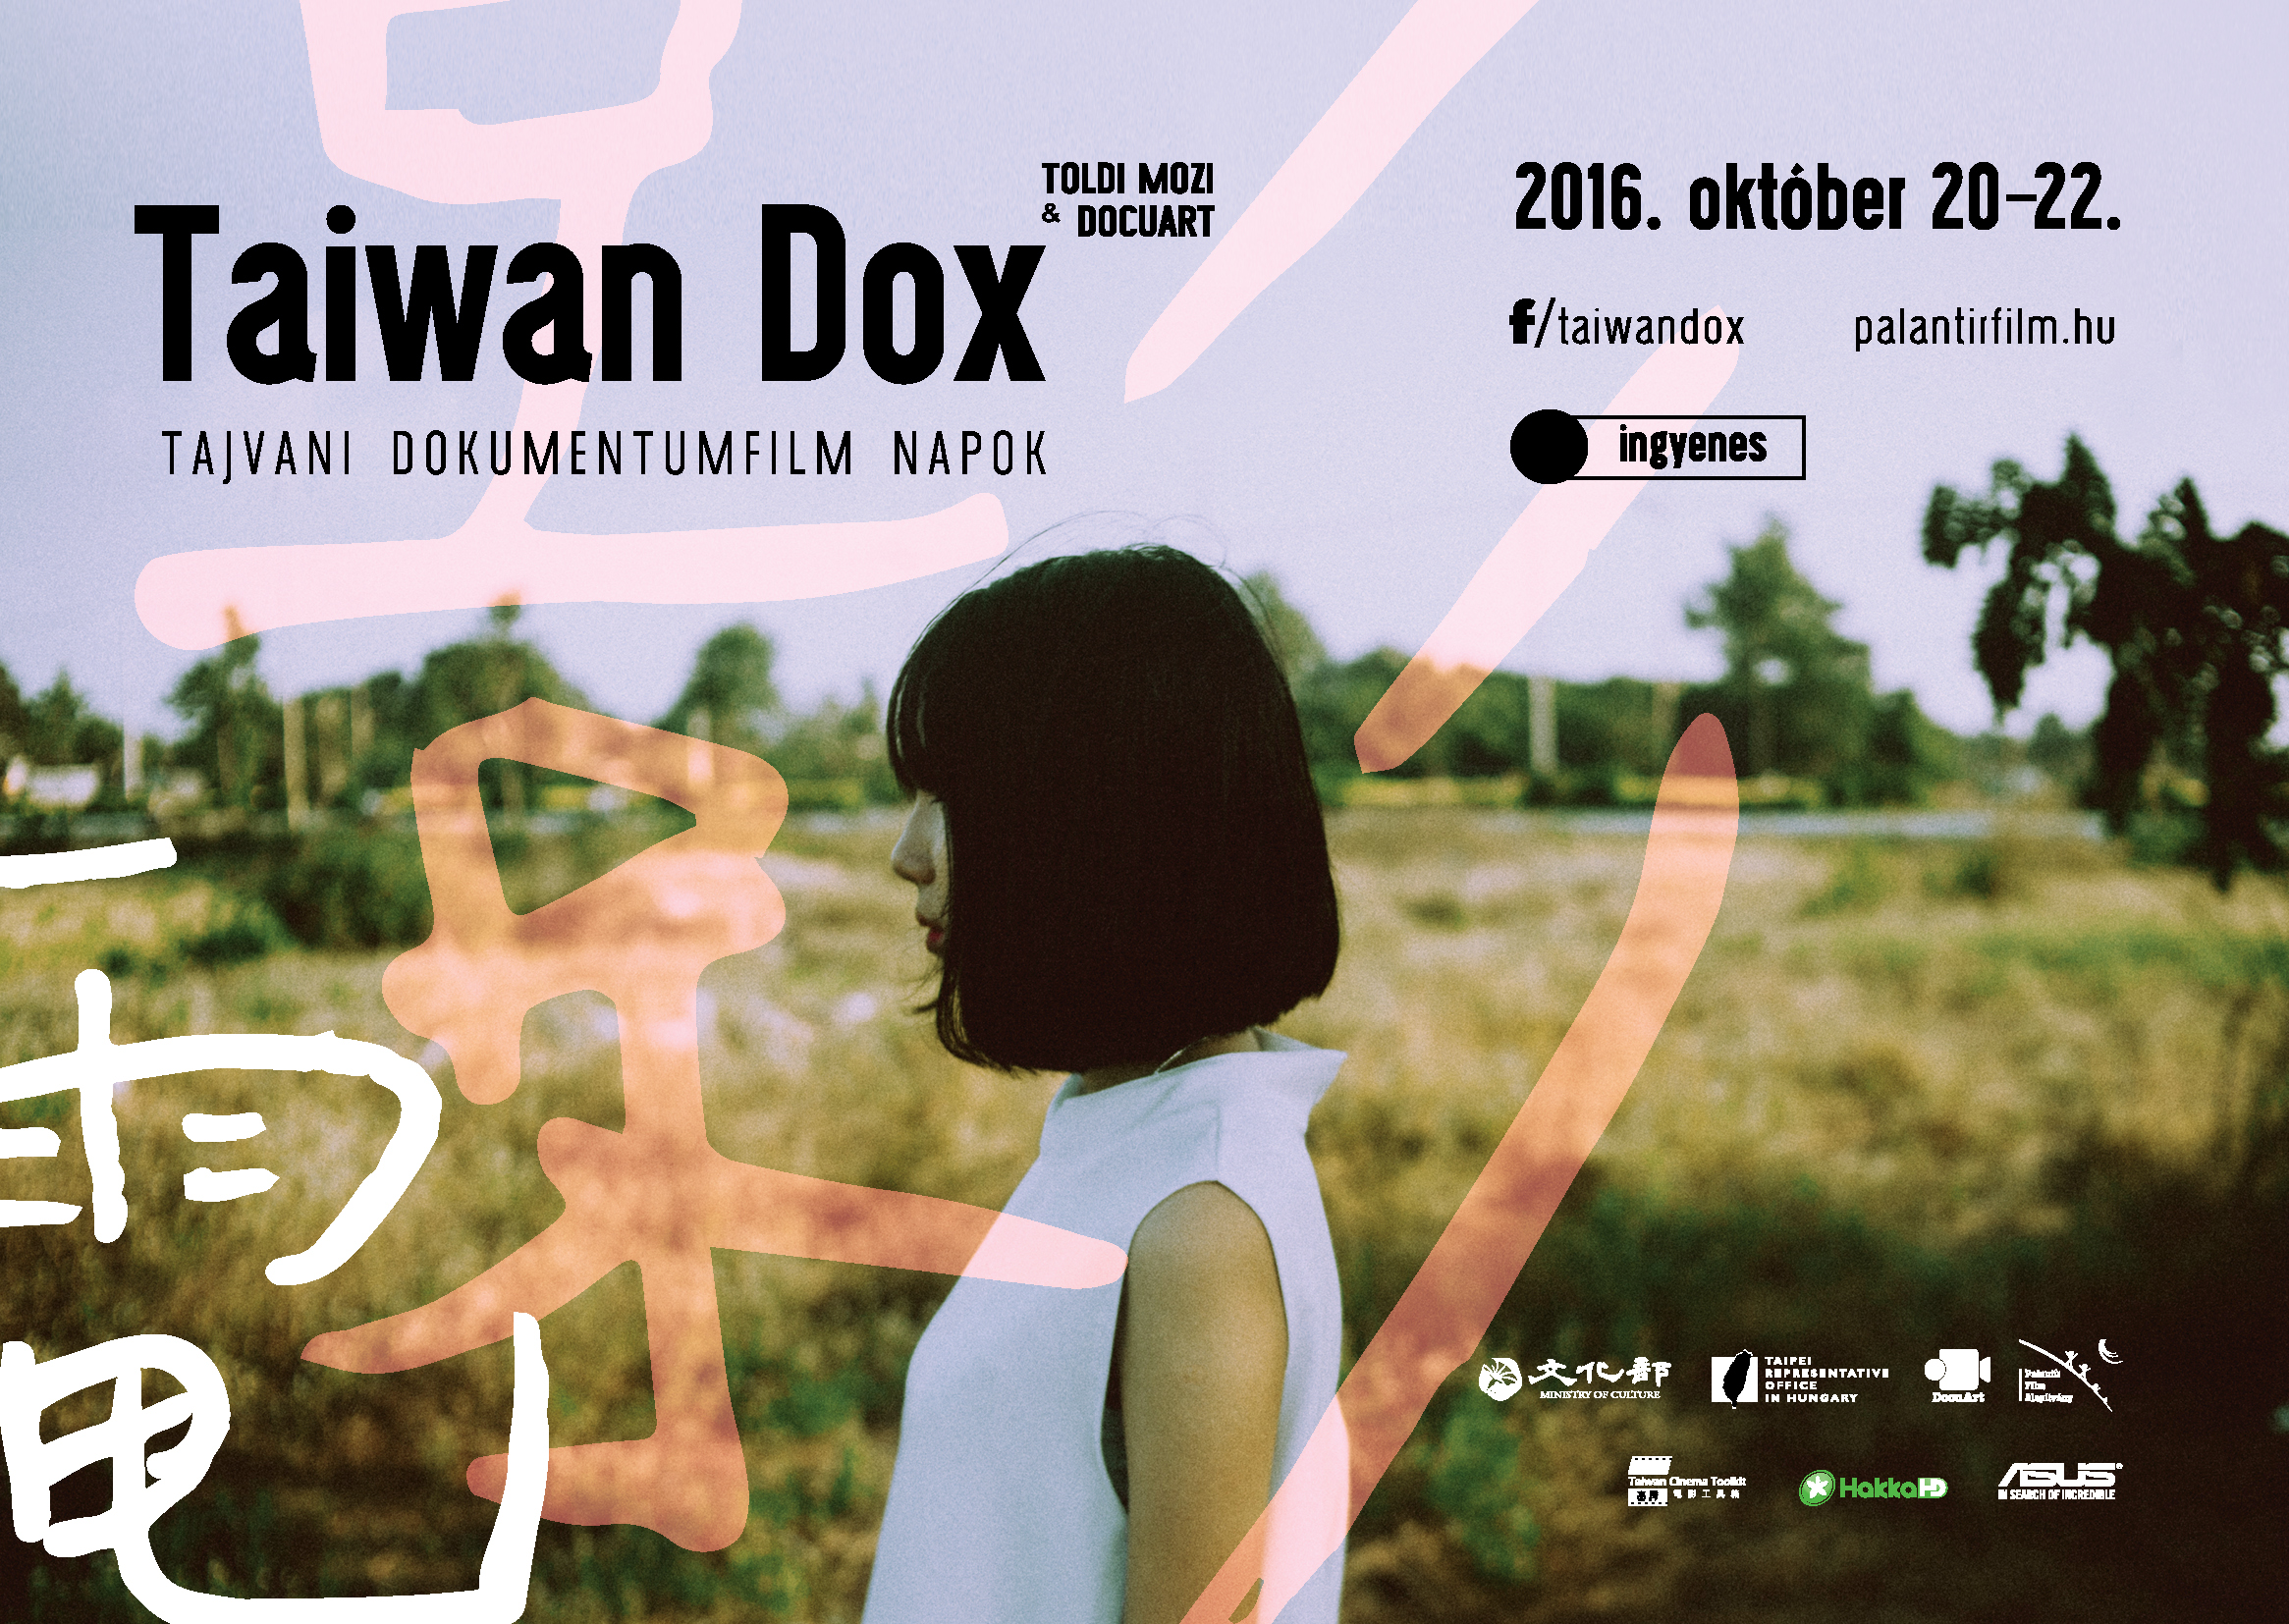 taiwan_dox.jpg